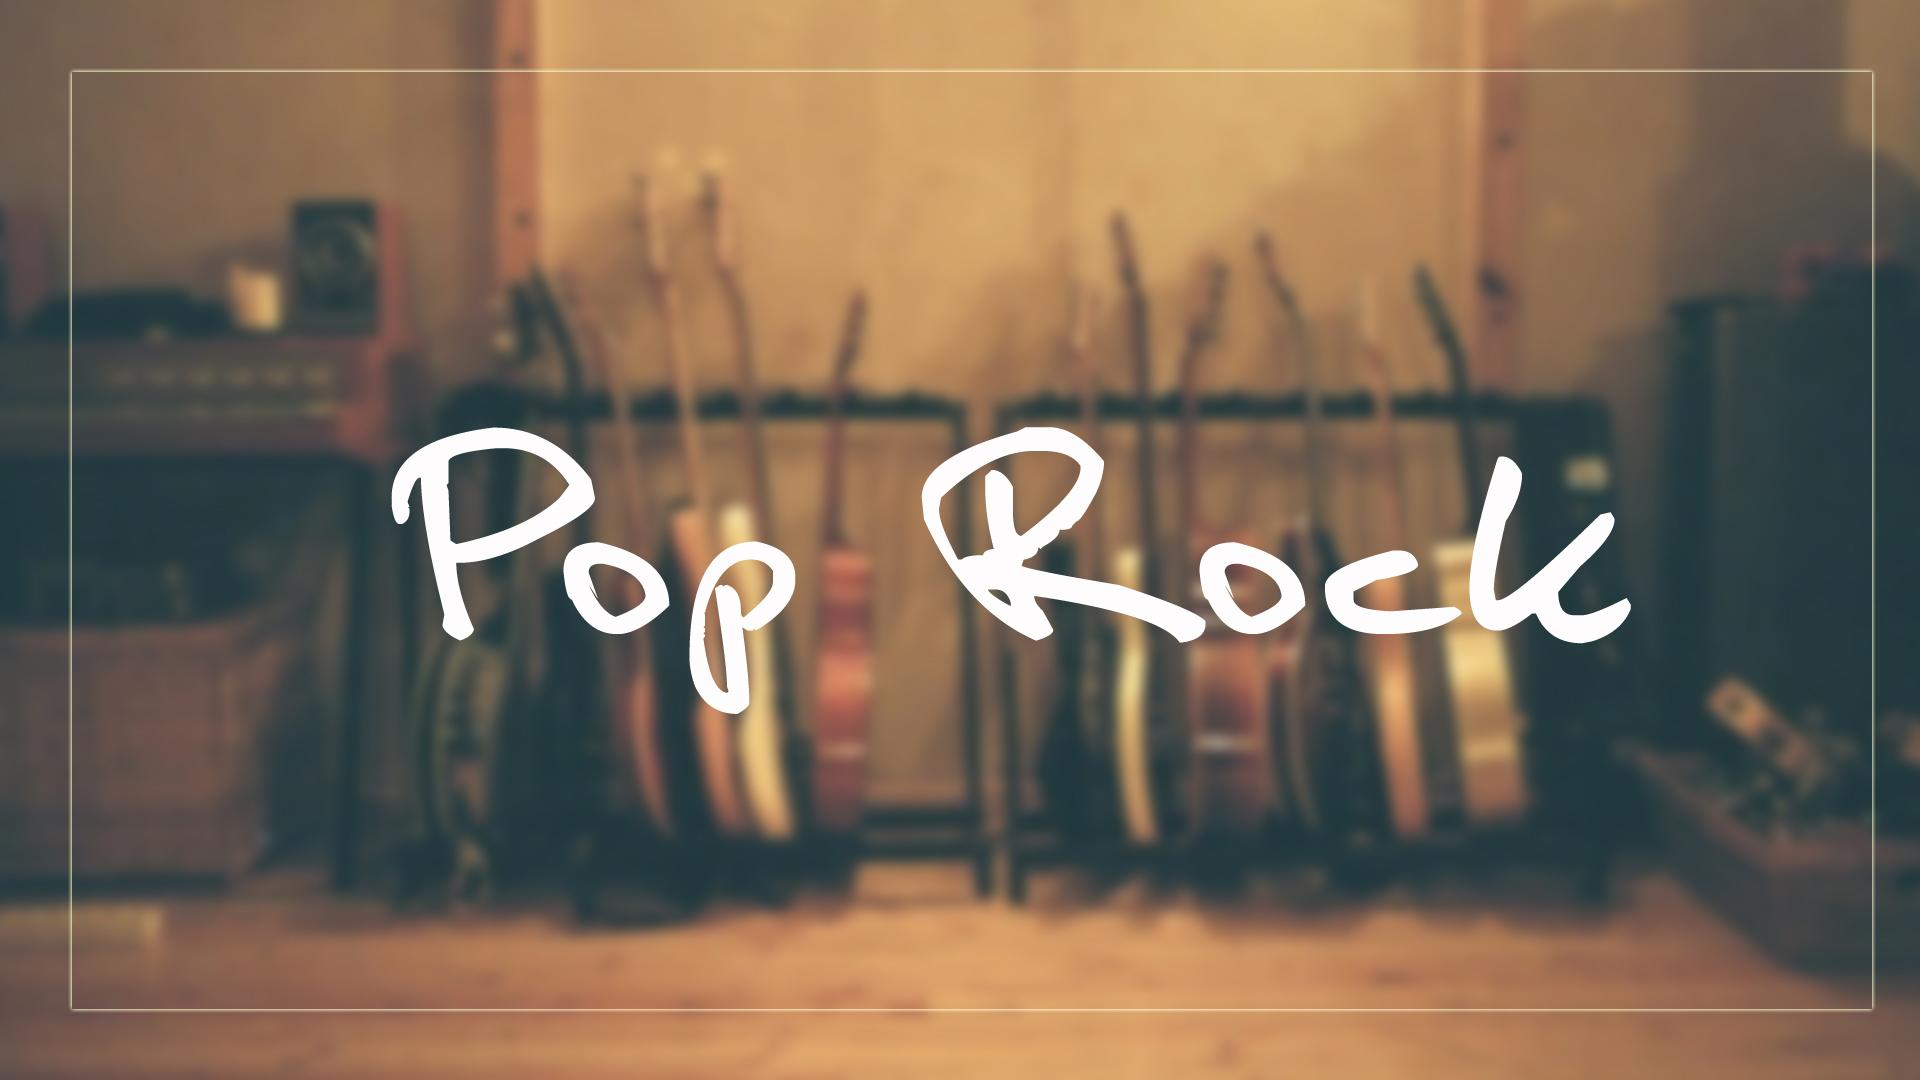 1920-X-1080-Pop-Rock-2